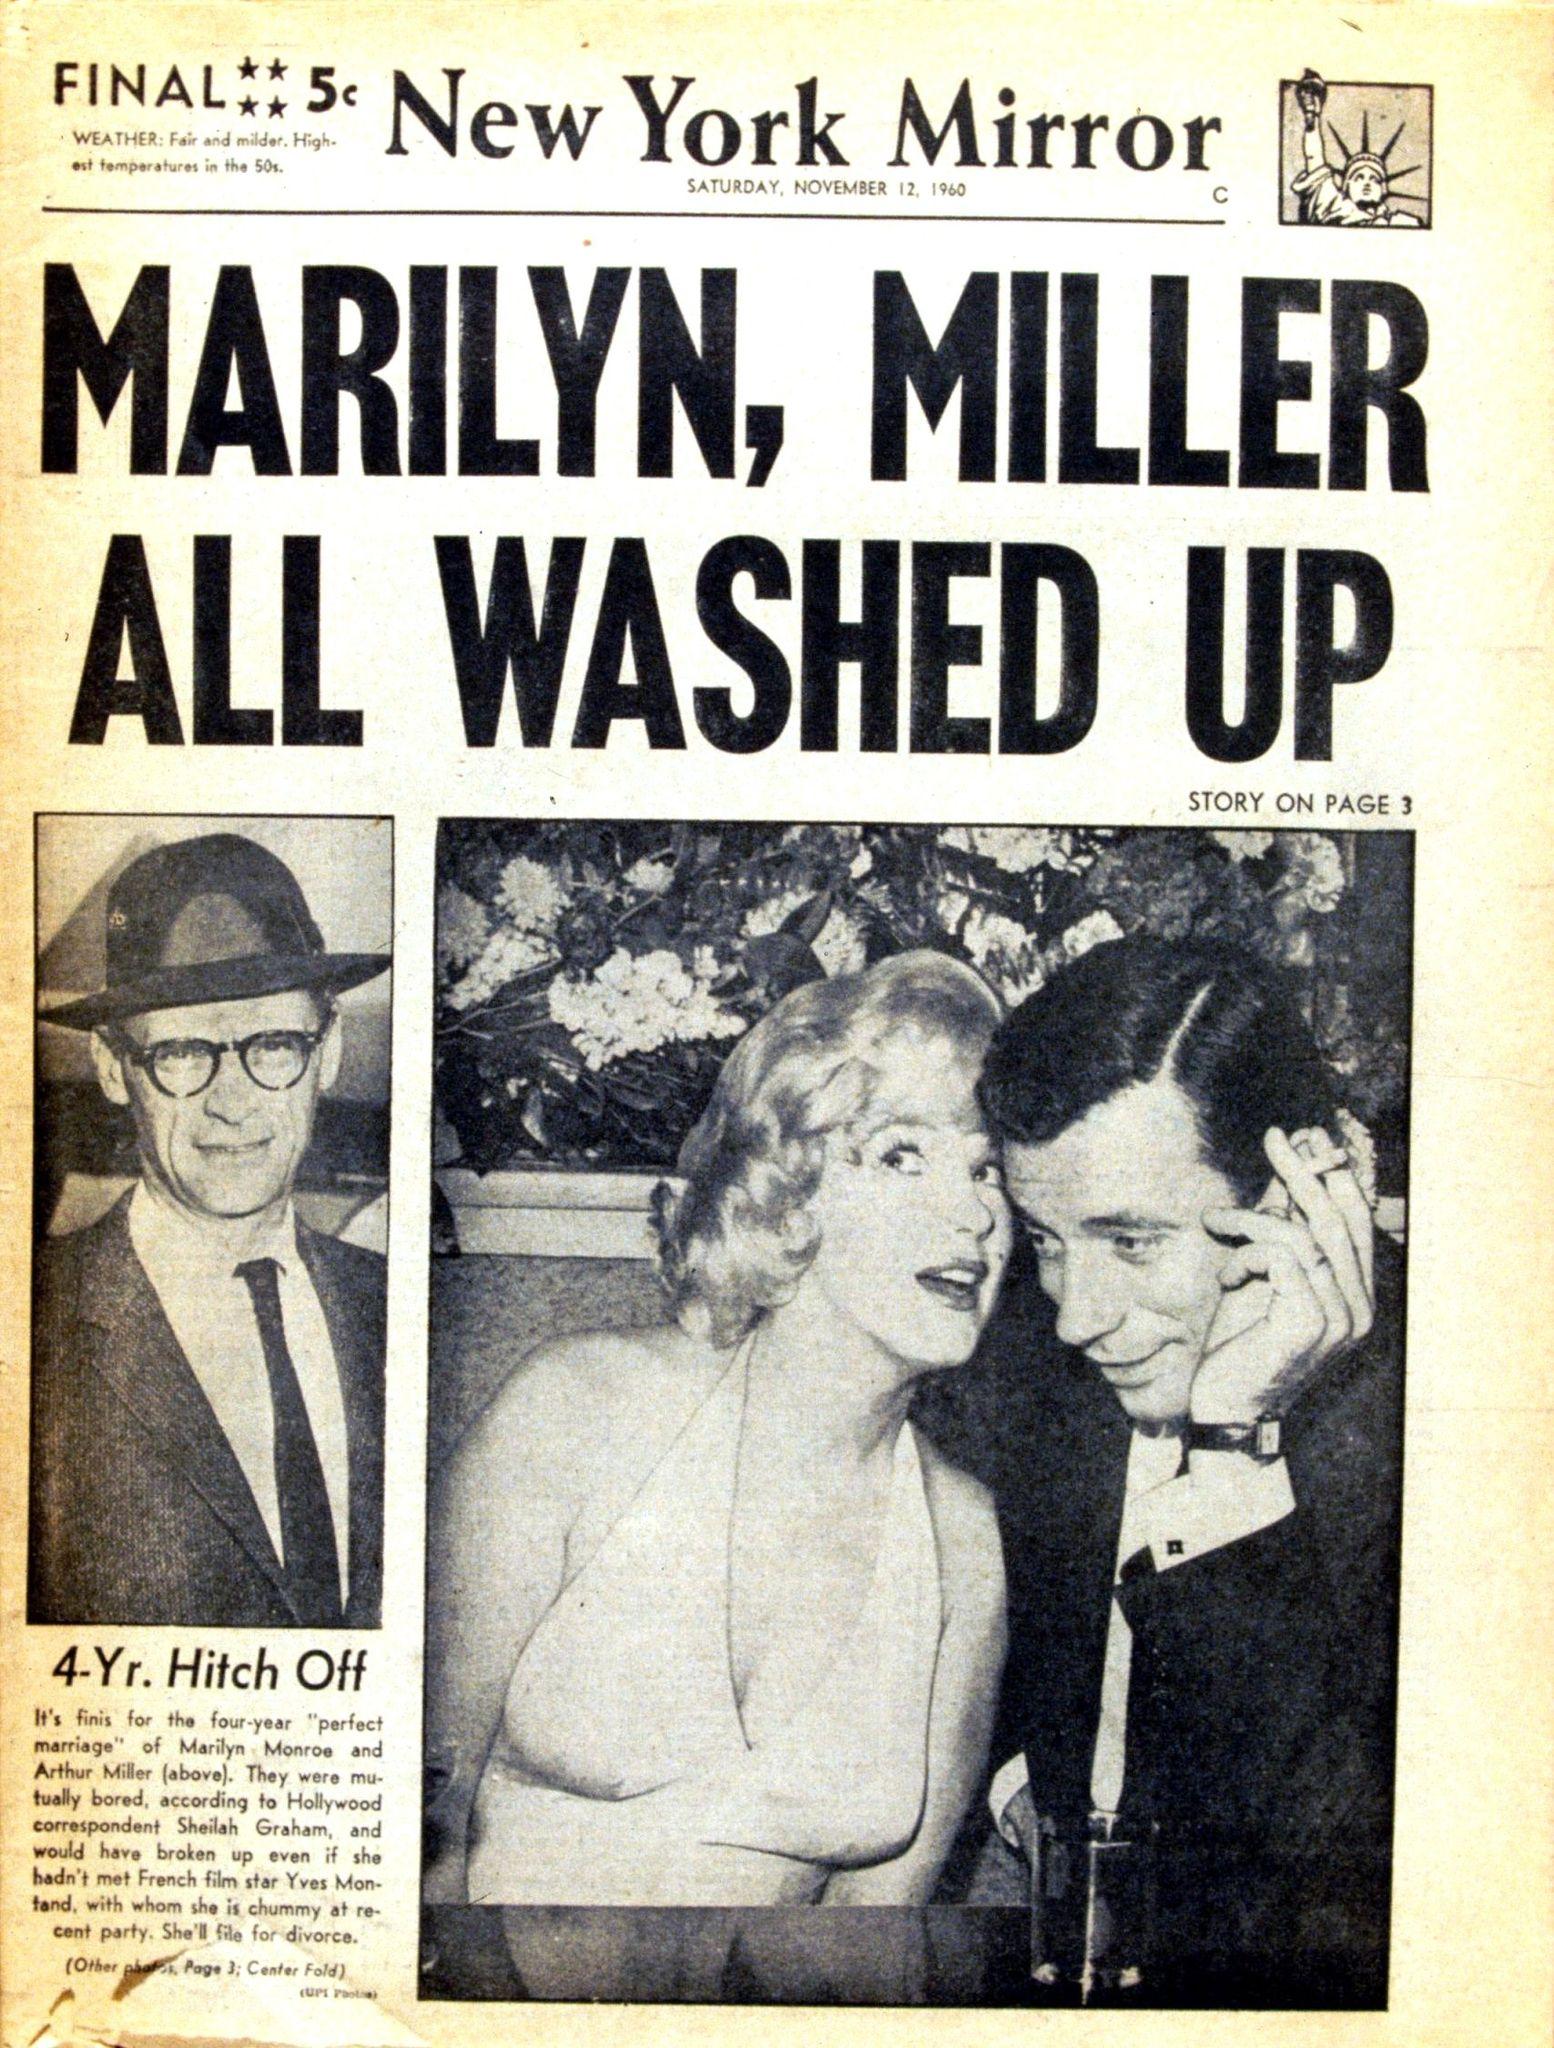 1960-11-12-new_york_mirror-usa